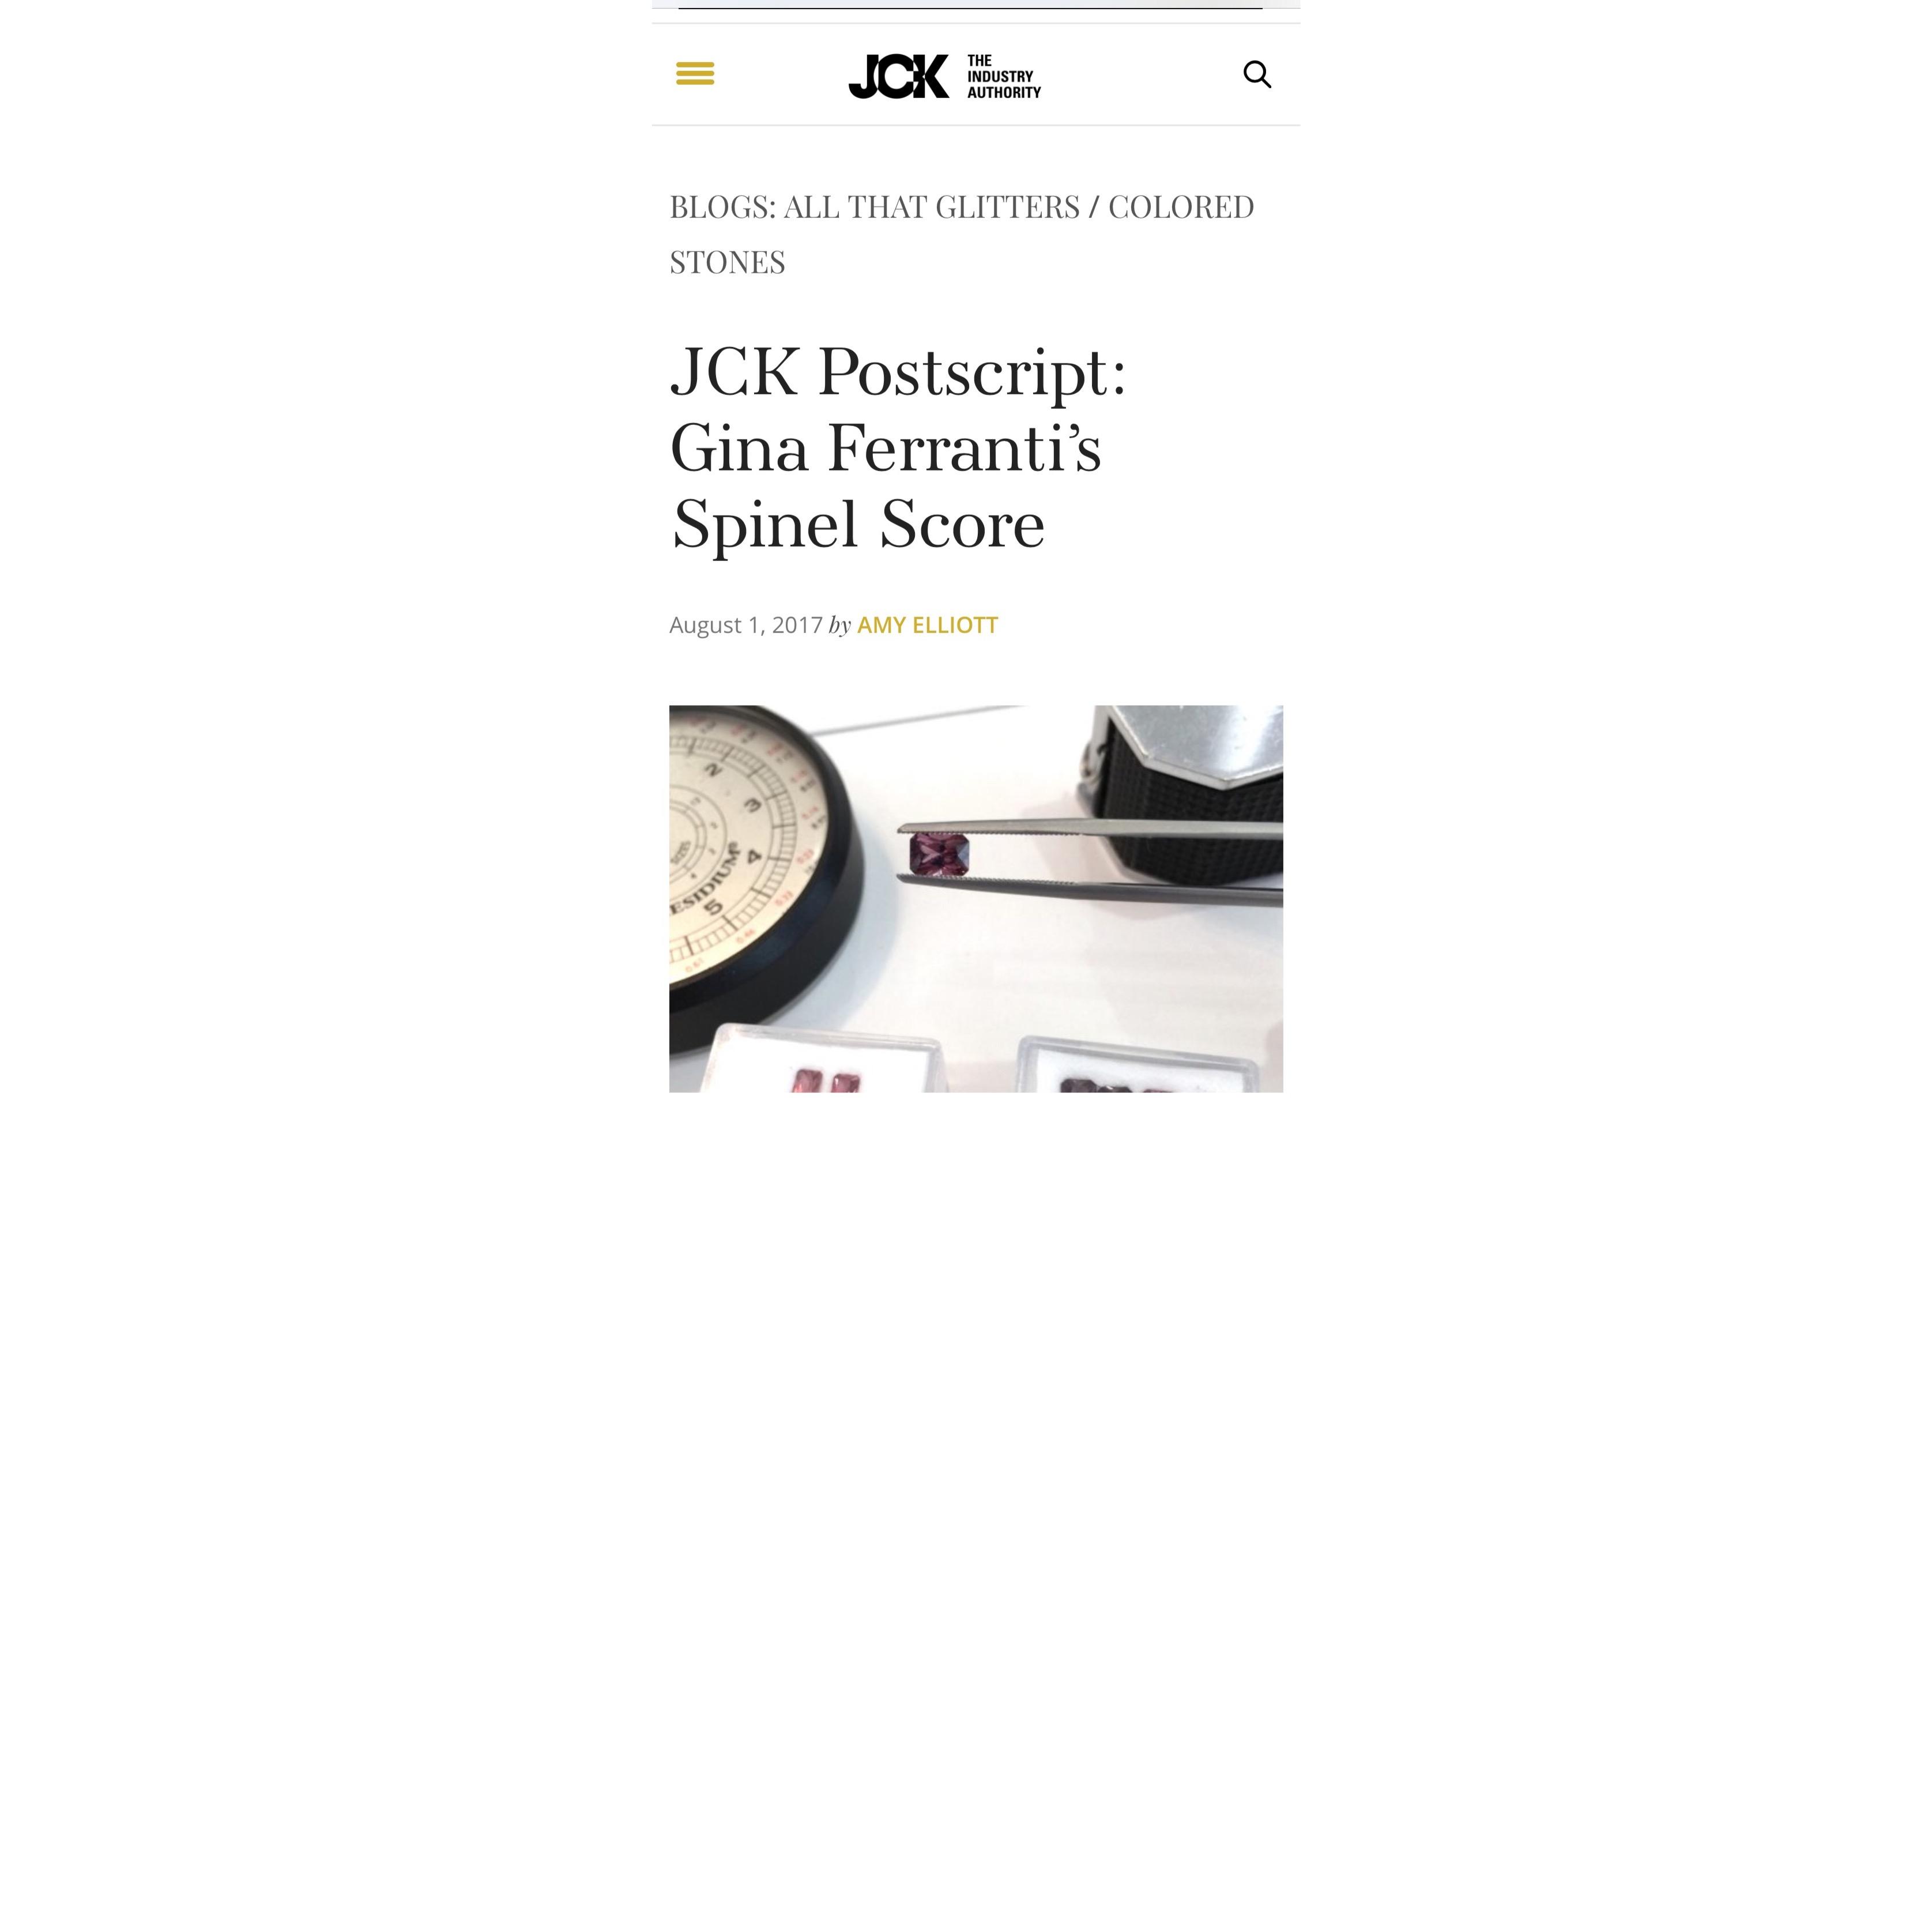 jckspinels.jpg